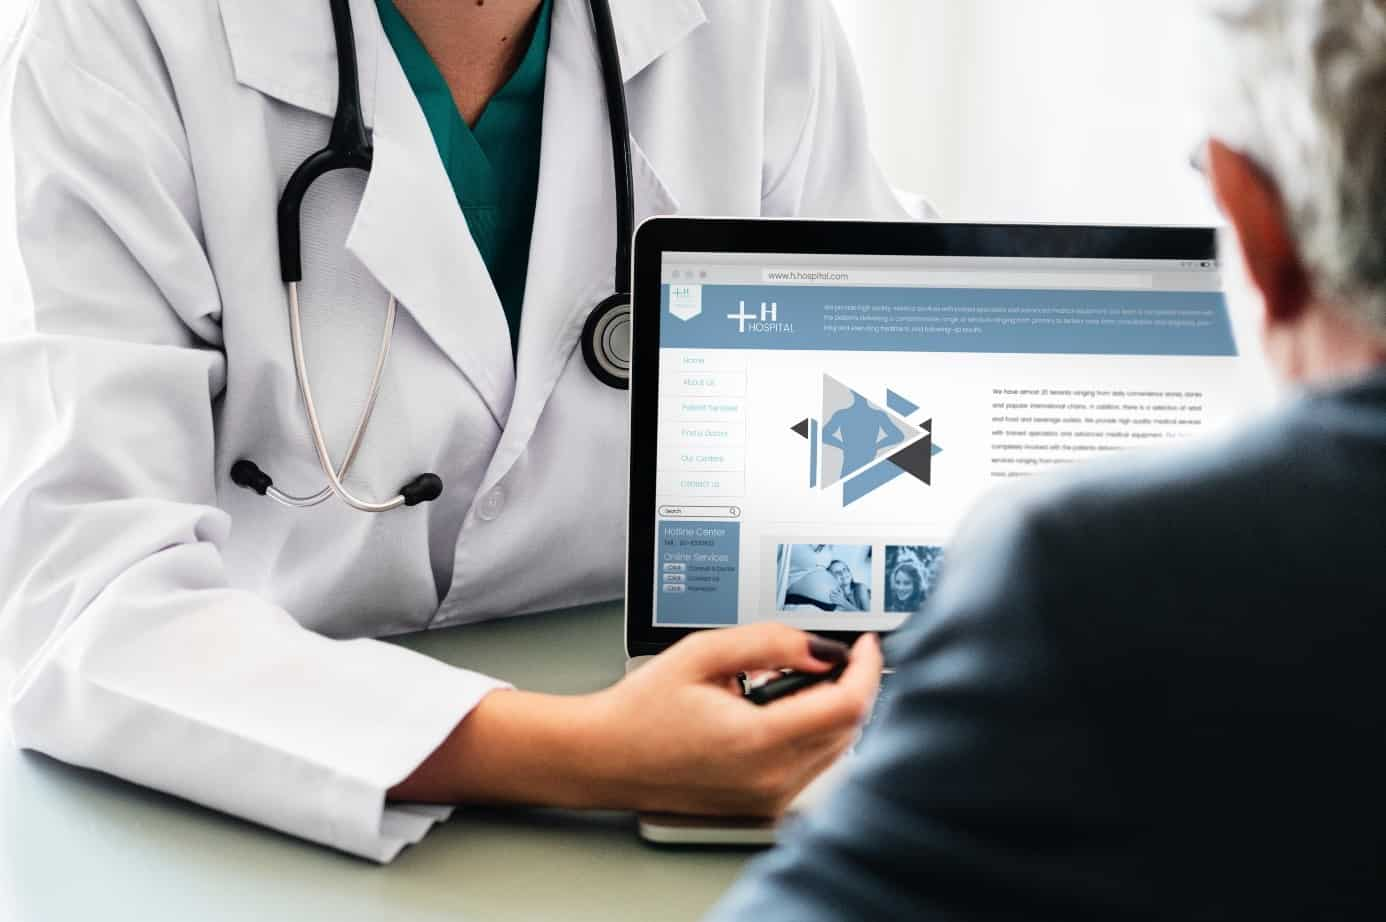 urologia, urolog, badania